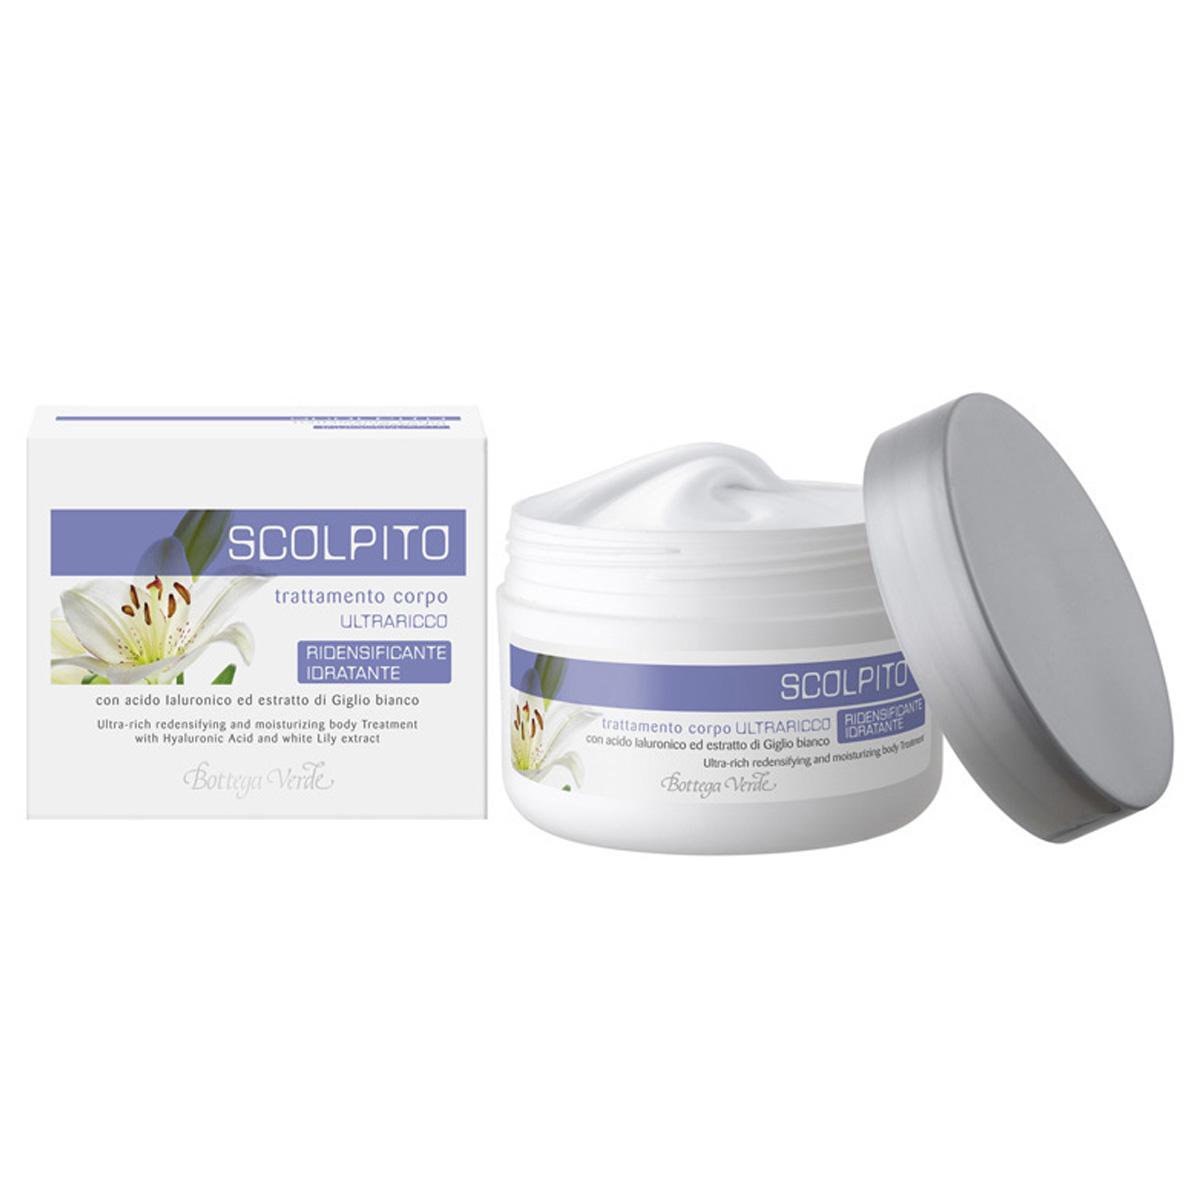 Scolpito - Tratament Pentru Corp Cu Acid Hialuroni